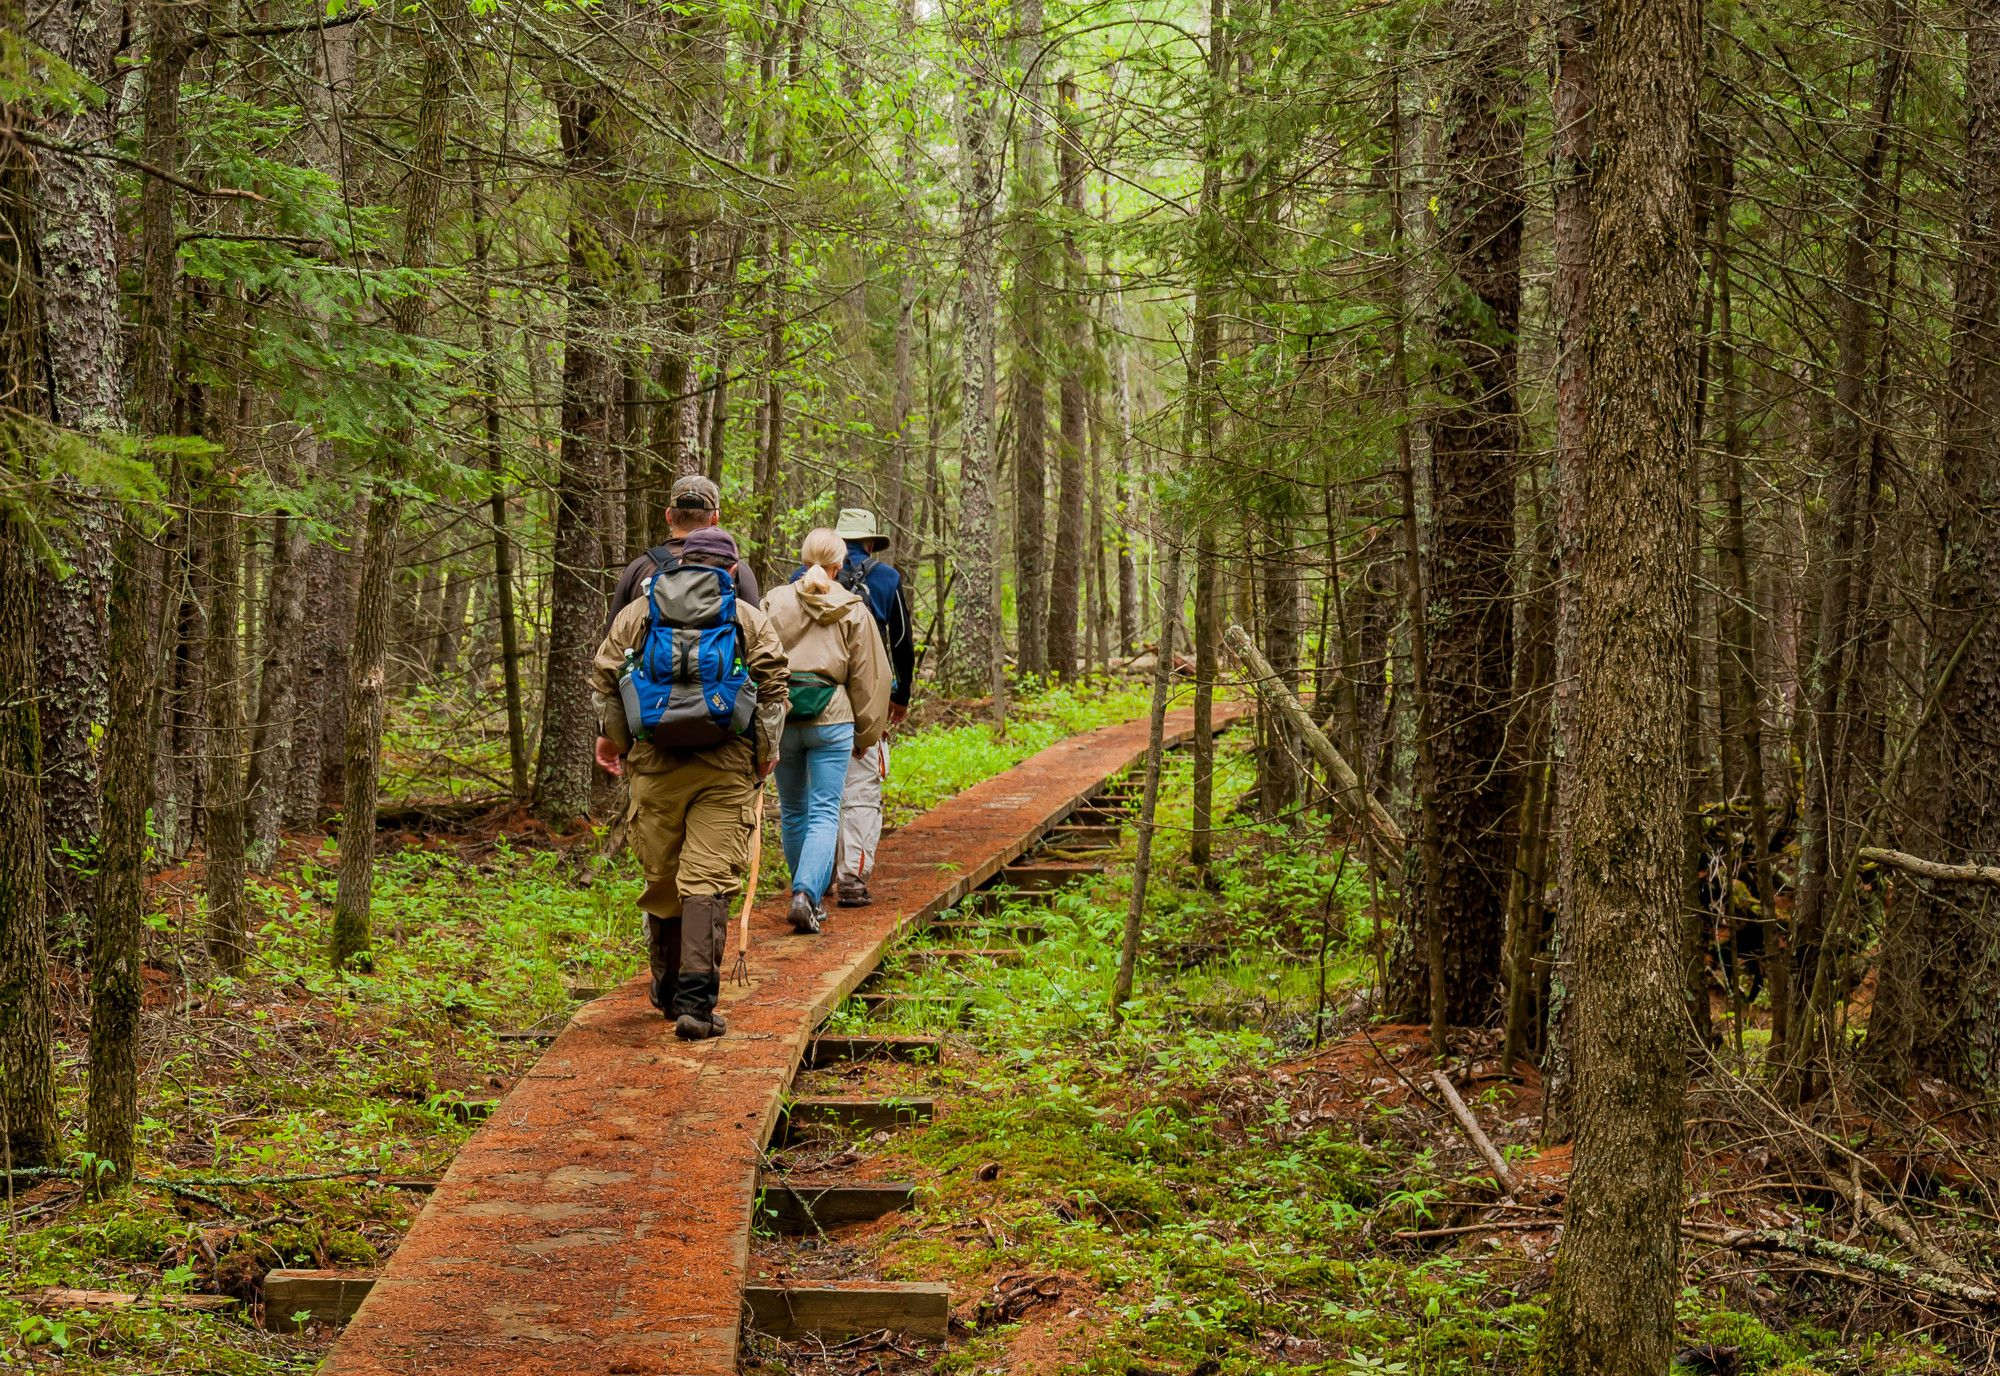 Where Are Minnesota S Secret Hiking Trails Don T Tell